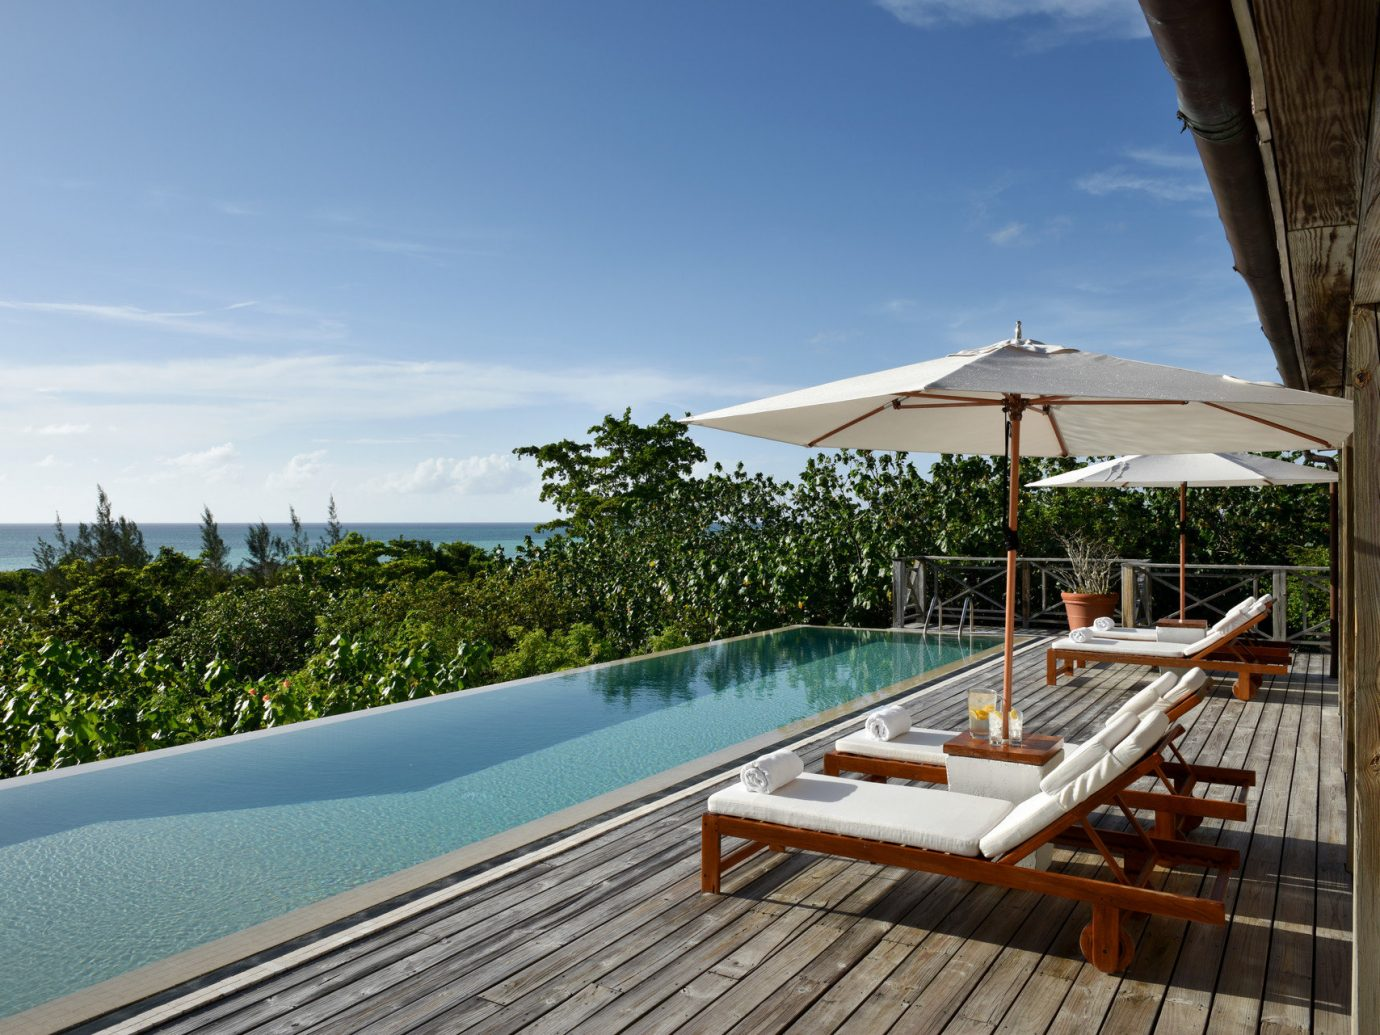 Hotels Trip Ideas sky outdoor leisure swimming pool property wooden vacation estate Resort Villa Sea real estate Beach Deck bay